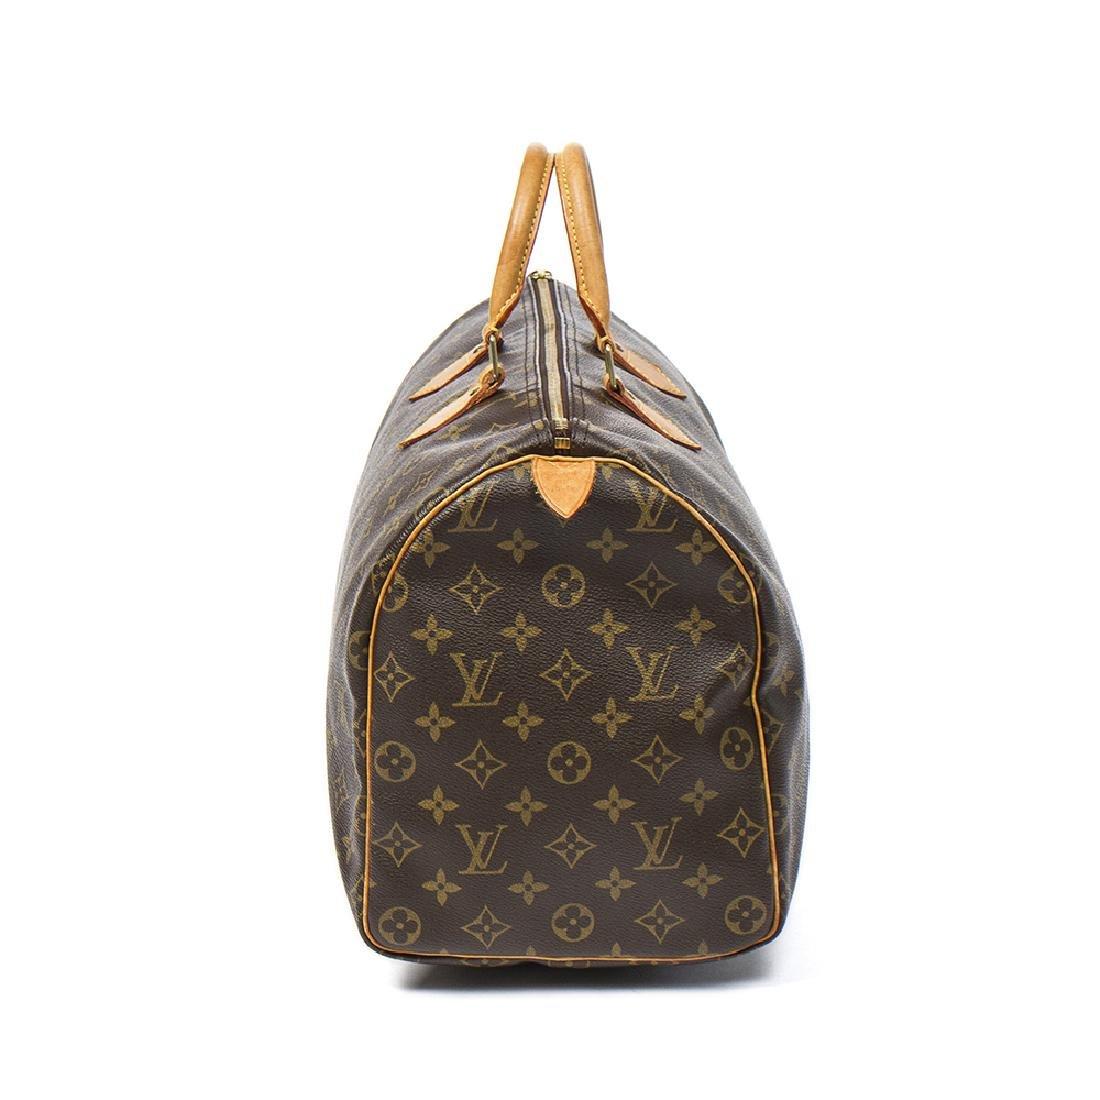 Louis Vuitton Speedy - 2